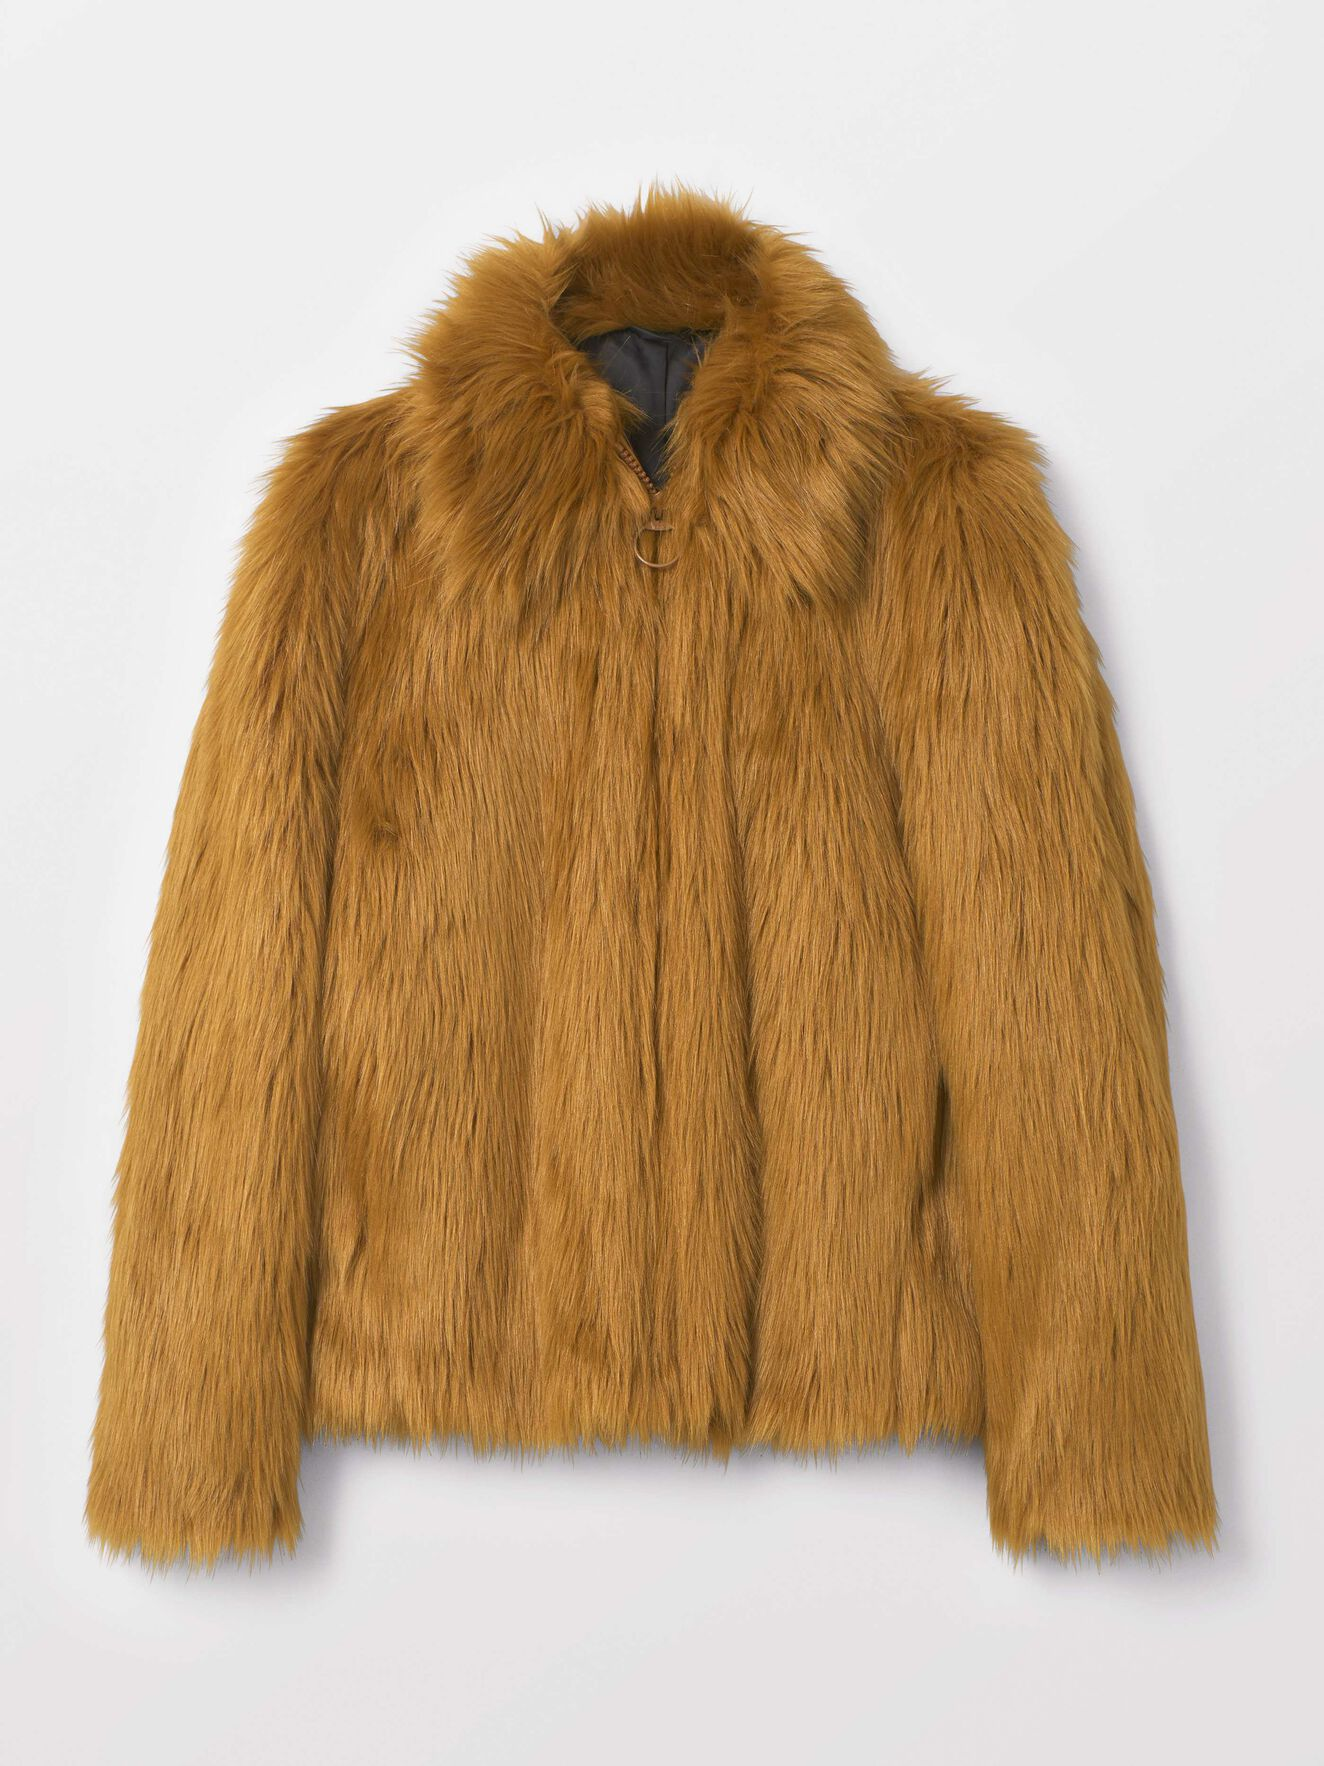 Sahn Jacket in Rusty Leaf from Tiger of Sweden